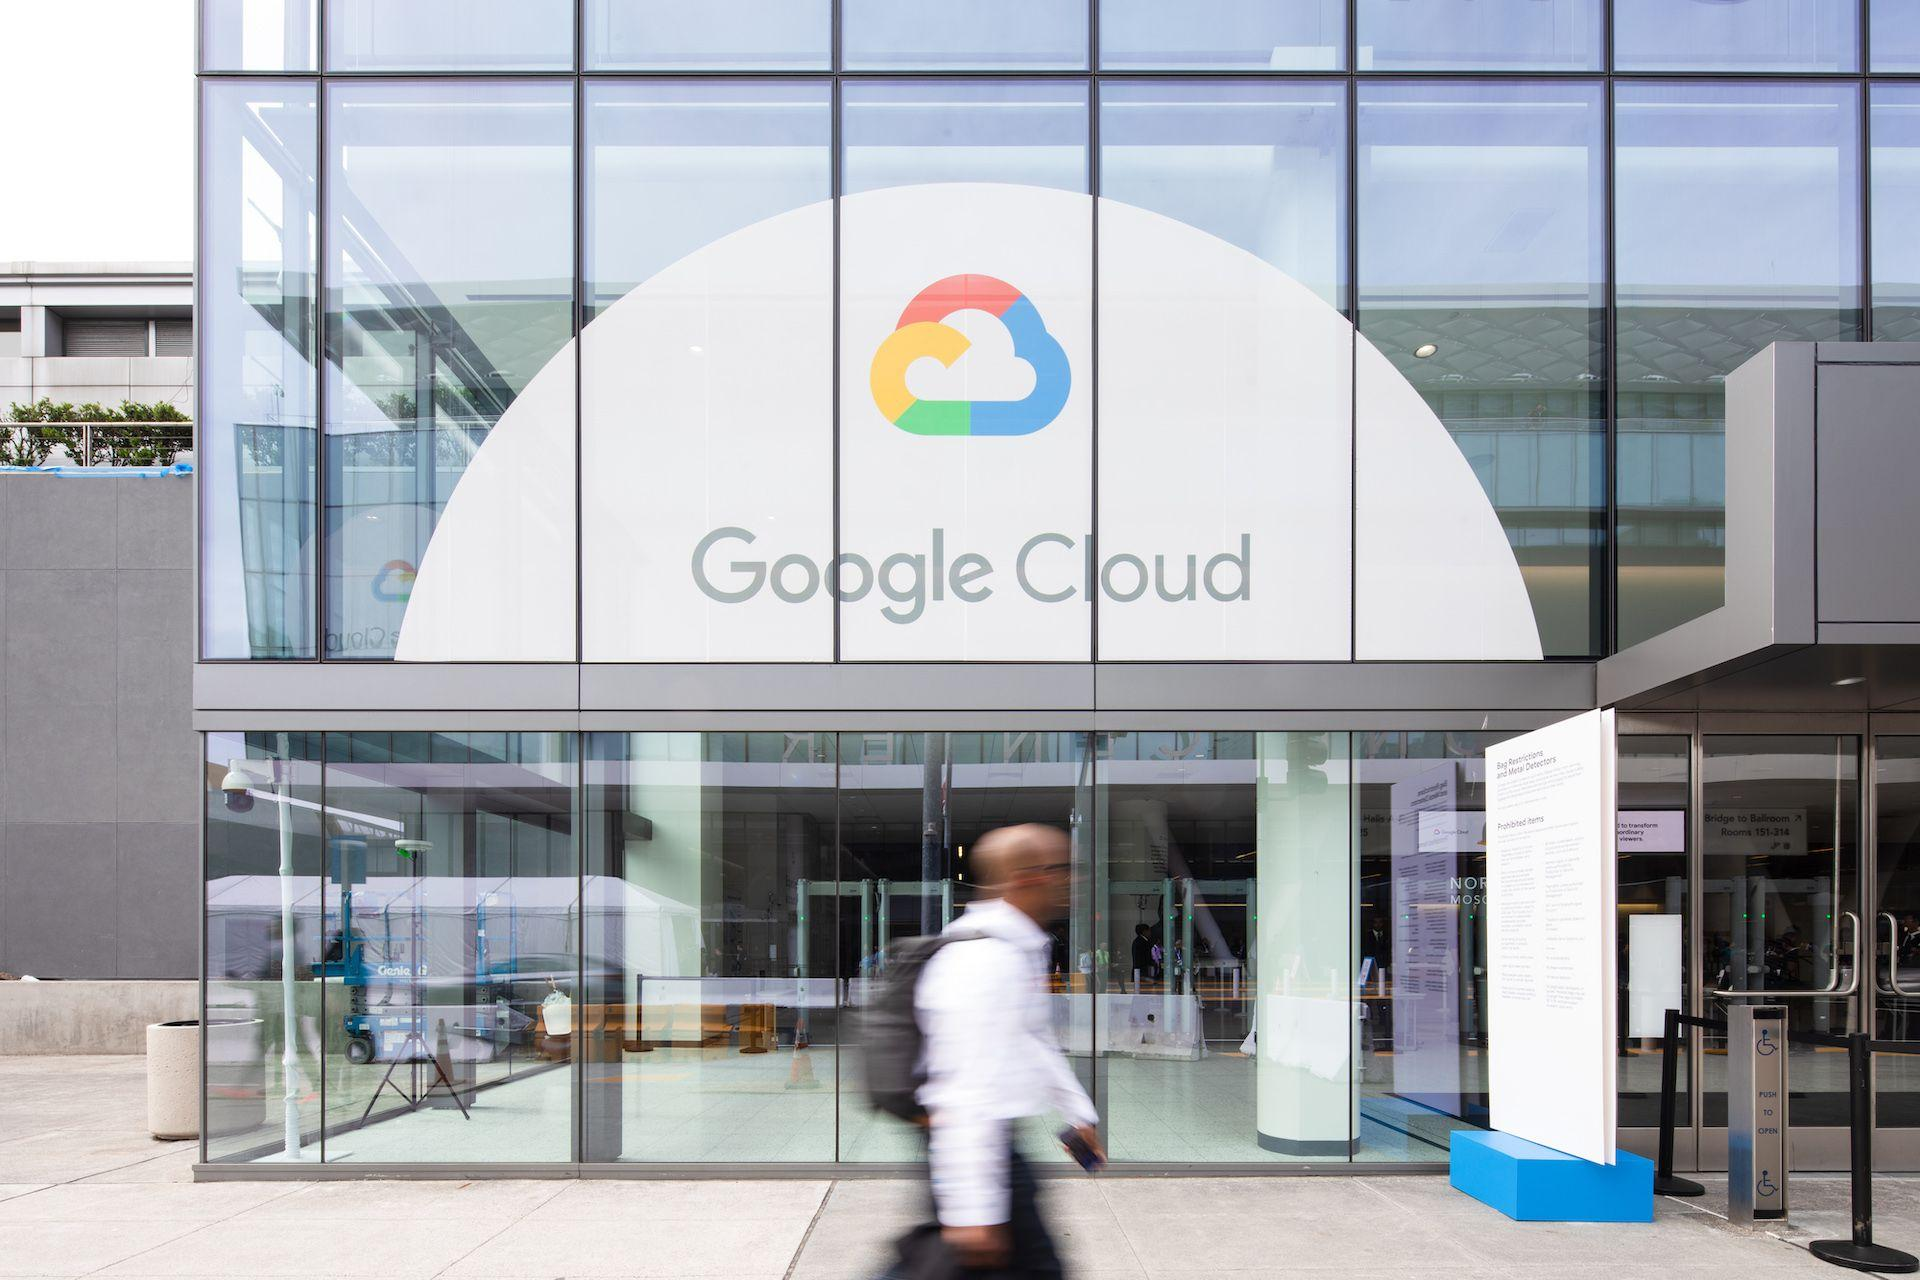 Google Cloud building